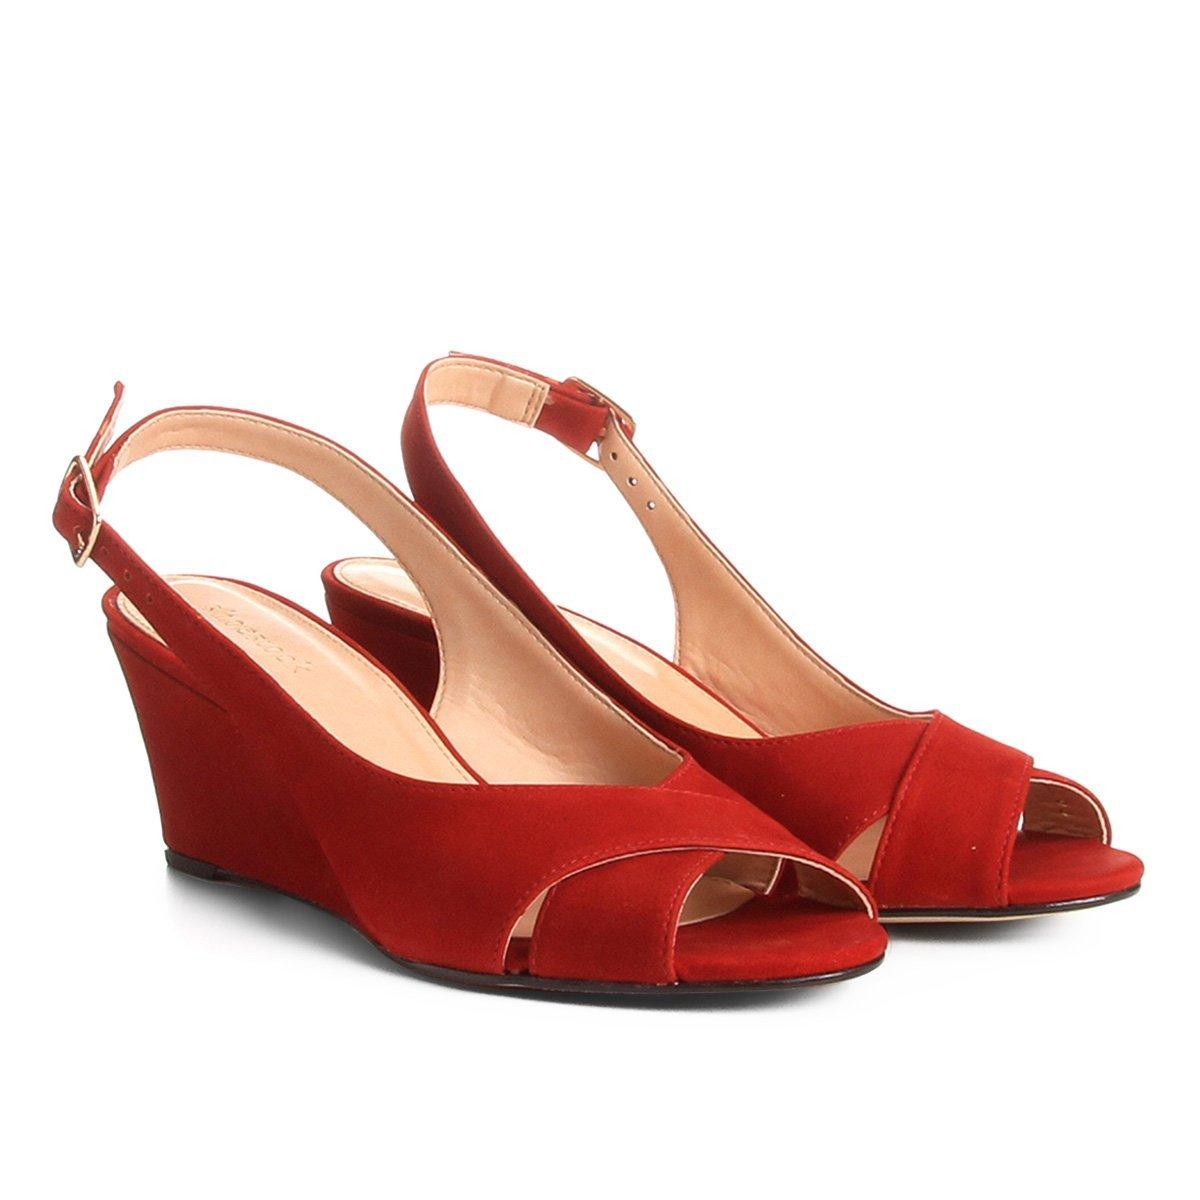 e495581b0 Sandália Anabela Couro Shoestock Nobuck Feminina | Shoestock